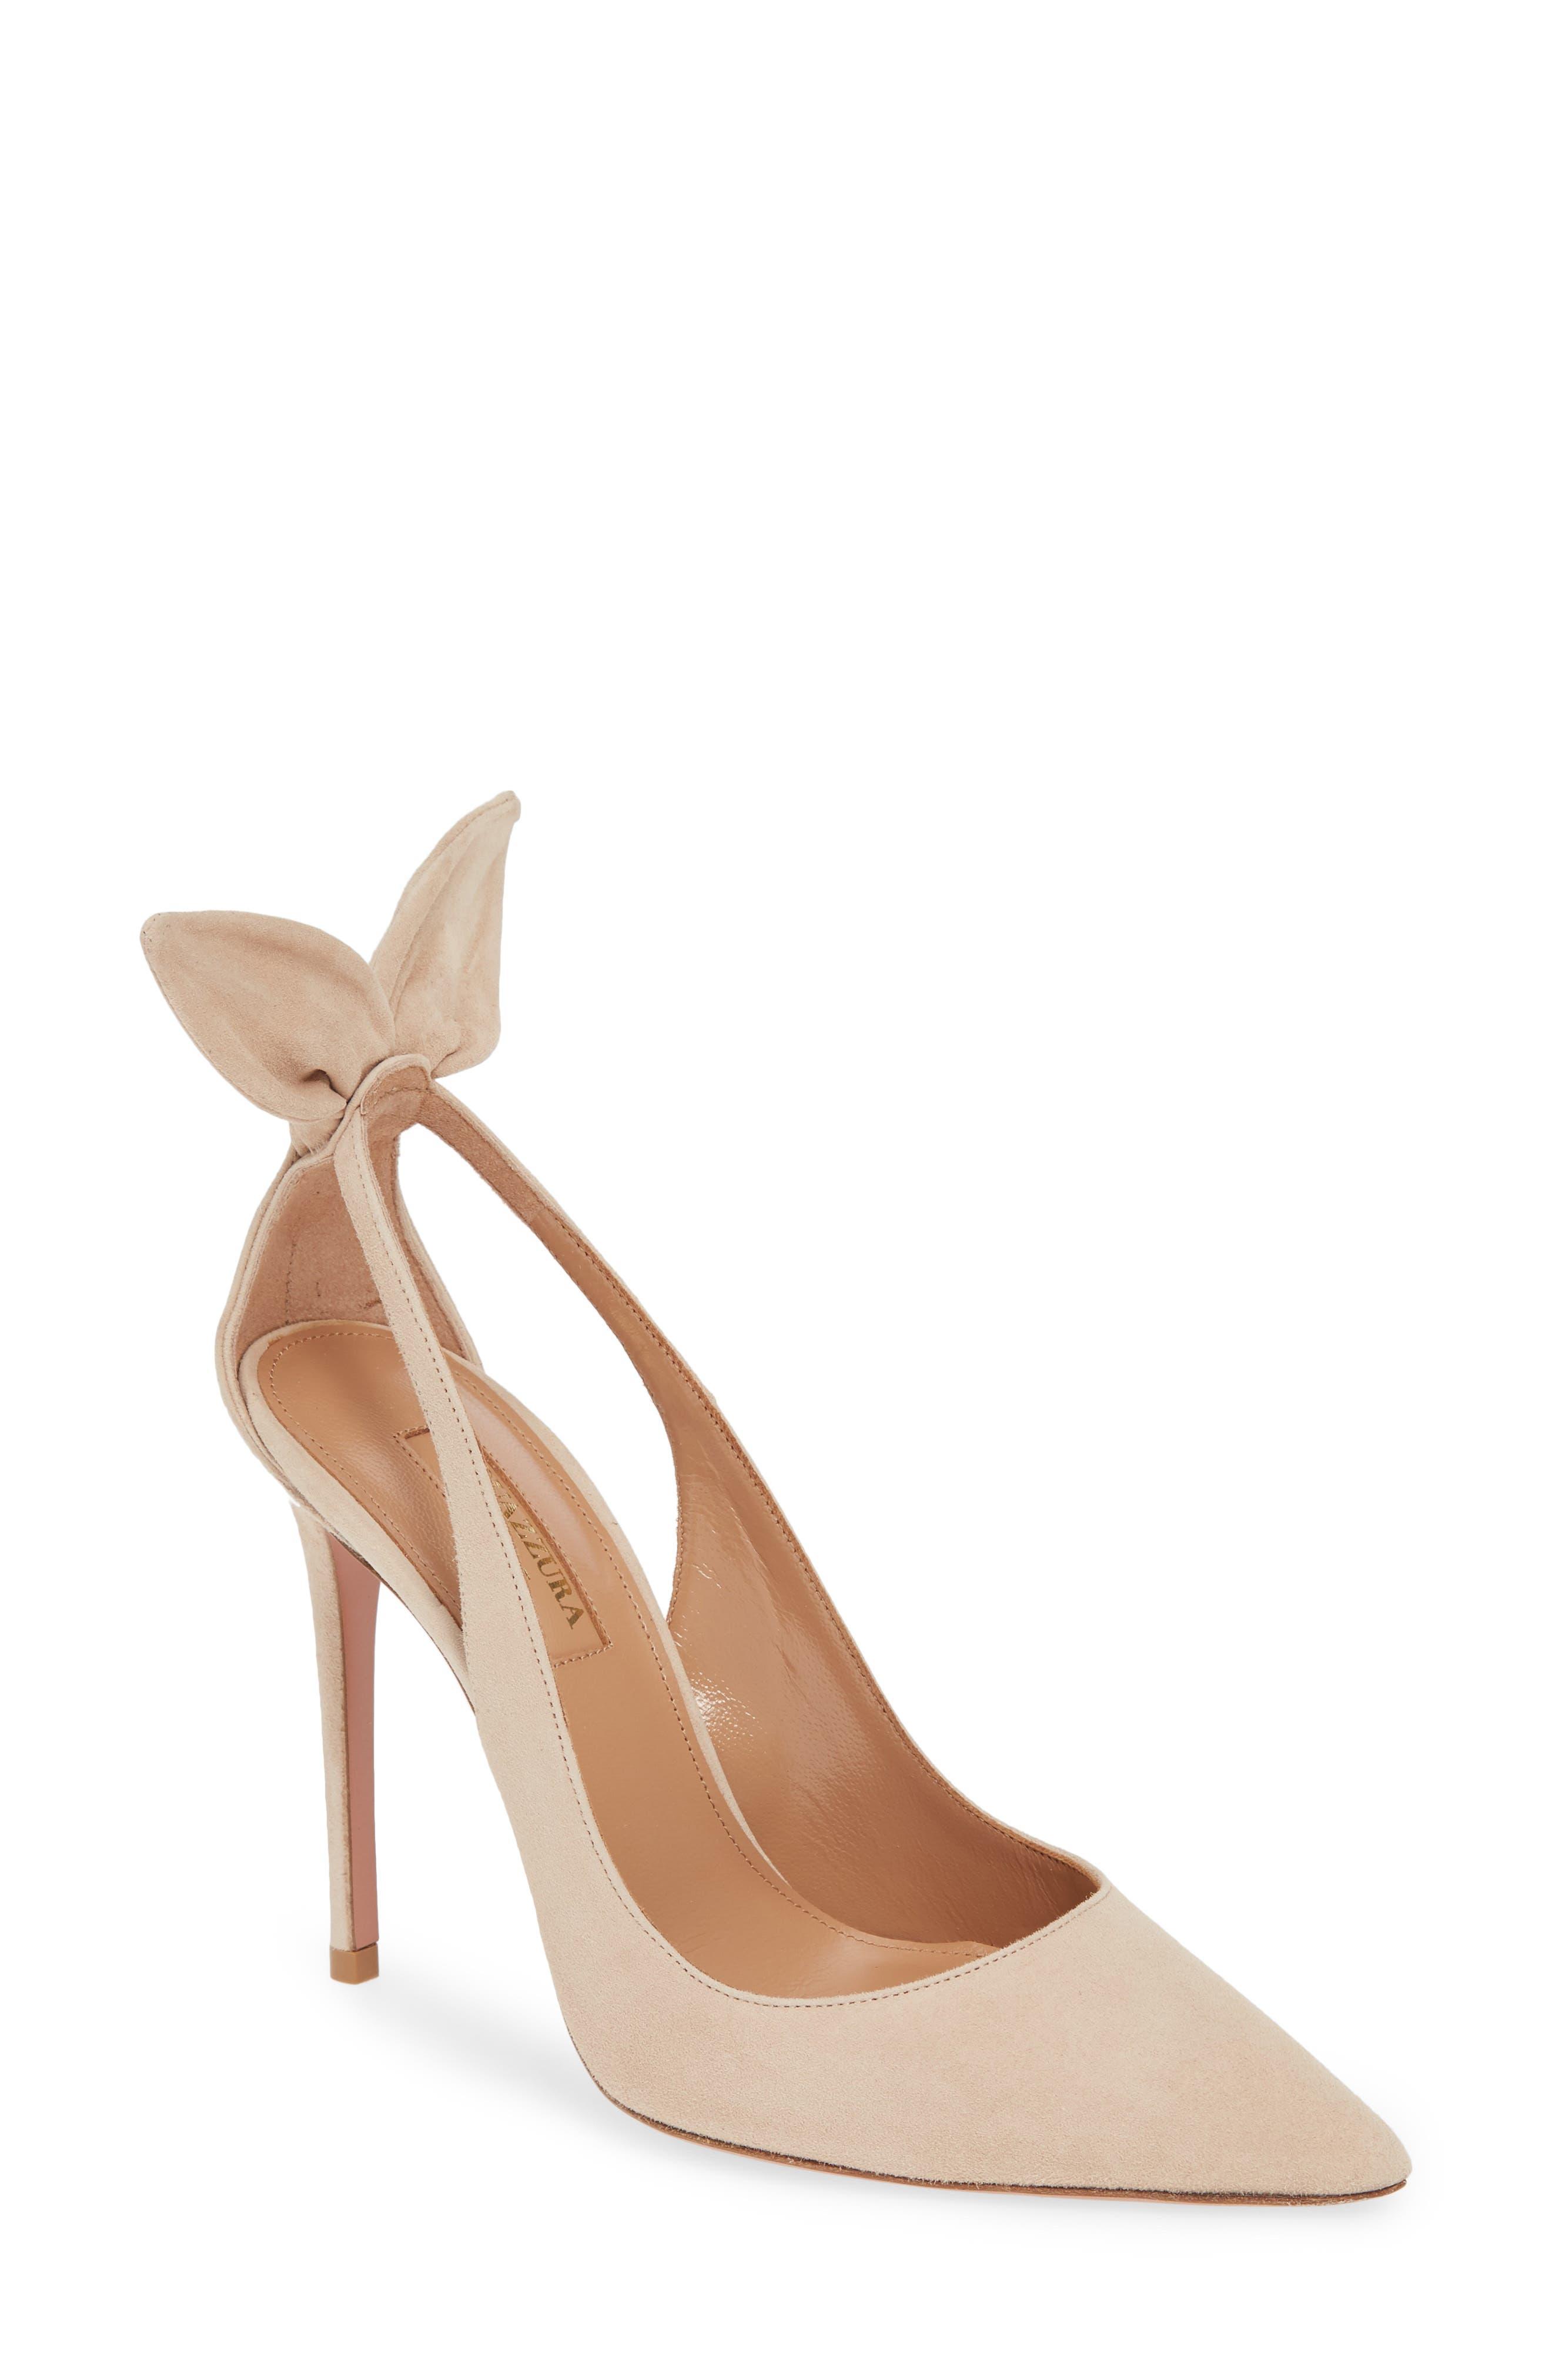 35ba19ce8 Women s AQUAZZURA Shoes